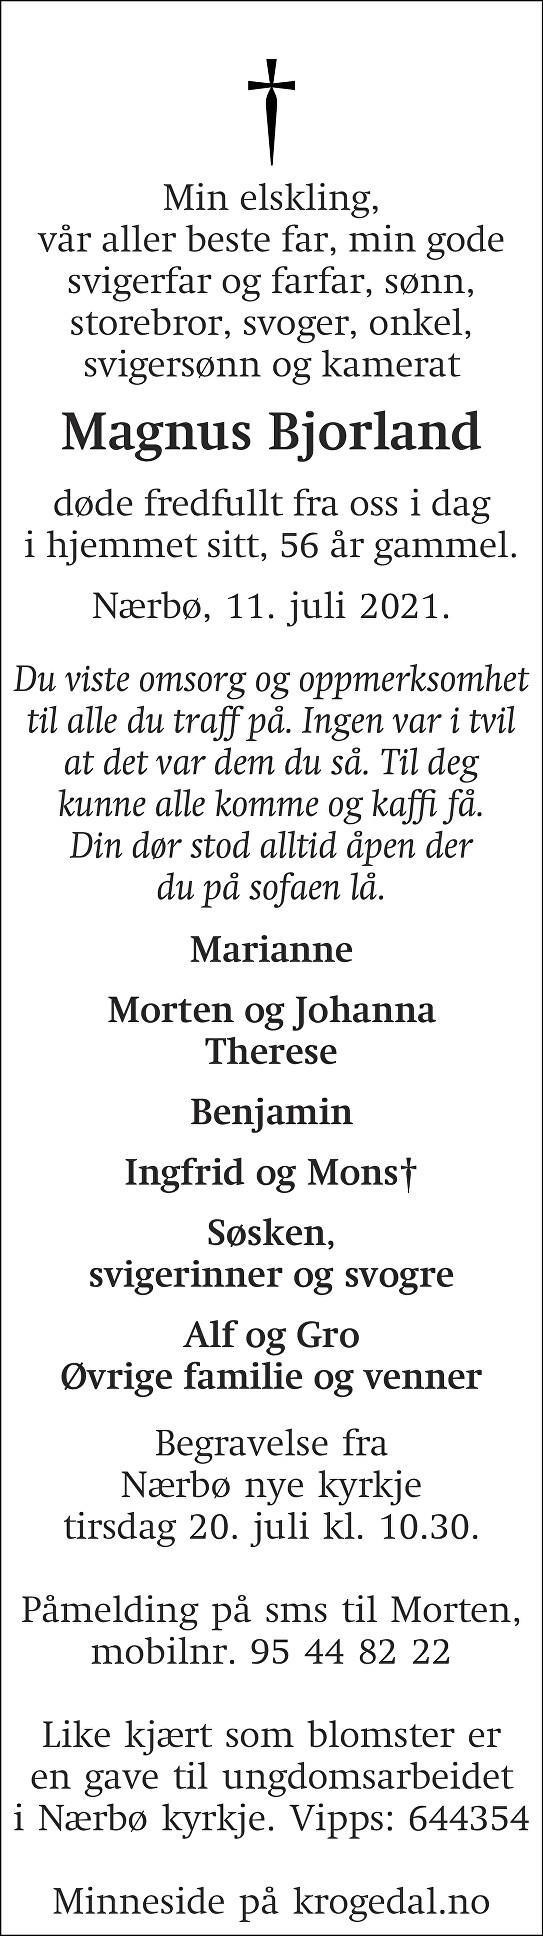 Magnus Bjorland Dødsannonse